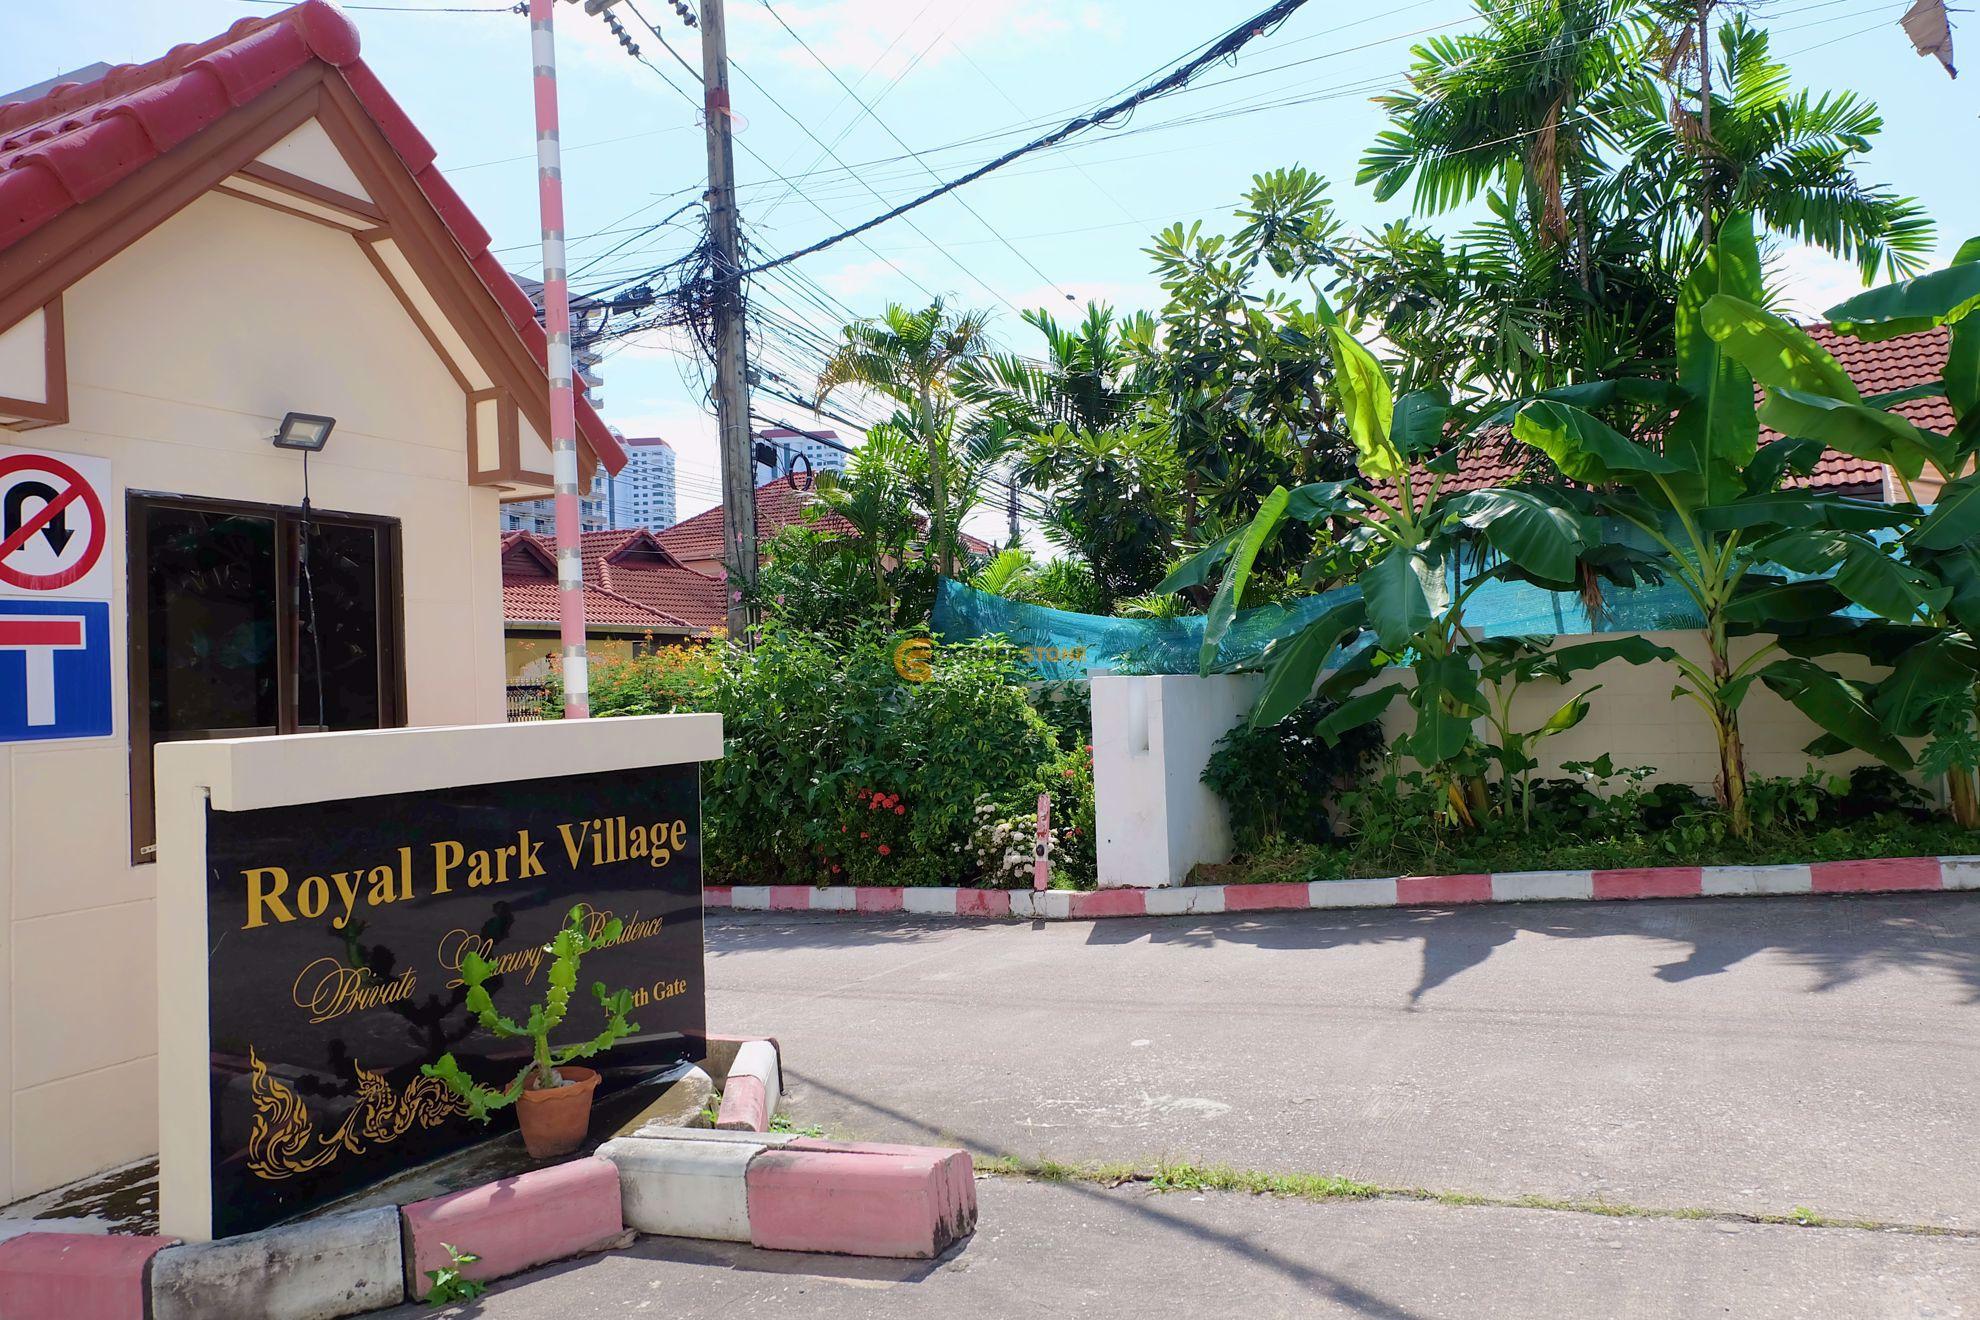 Royal Park Village